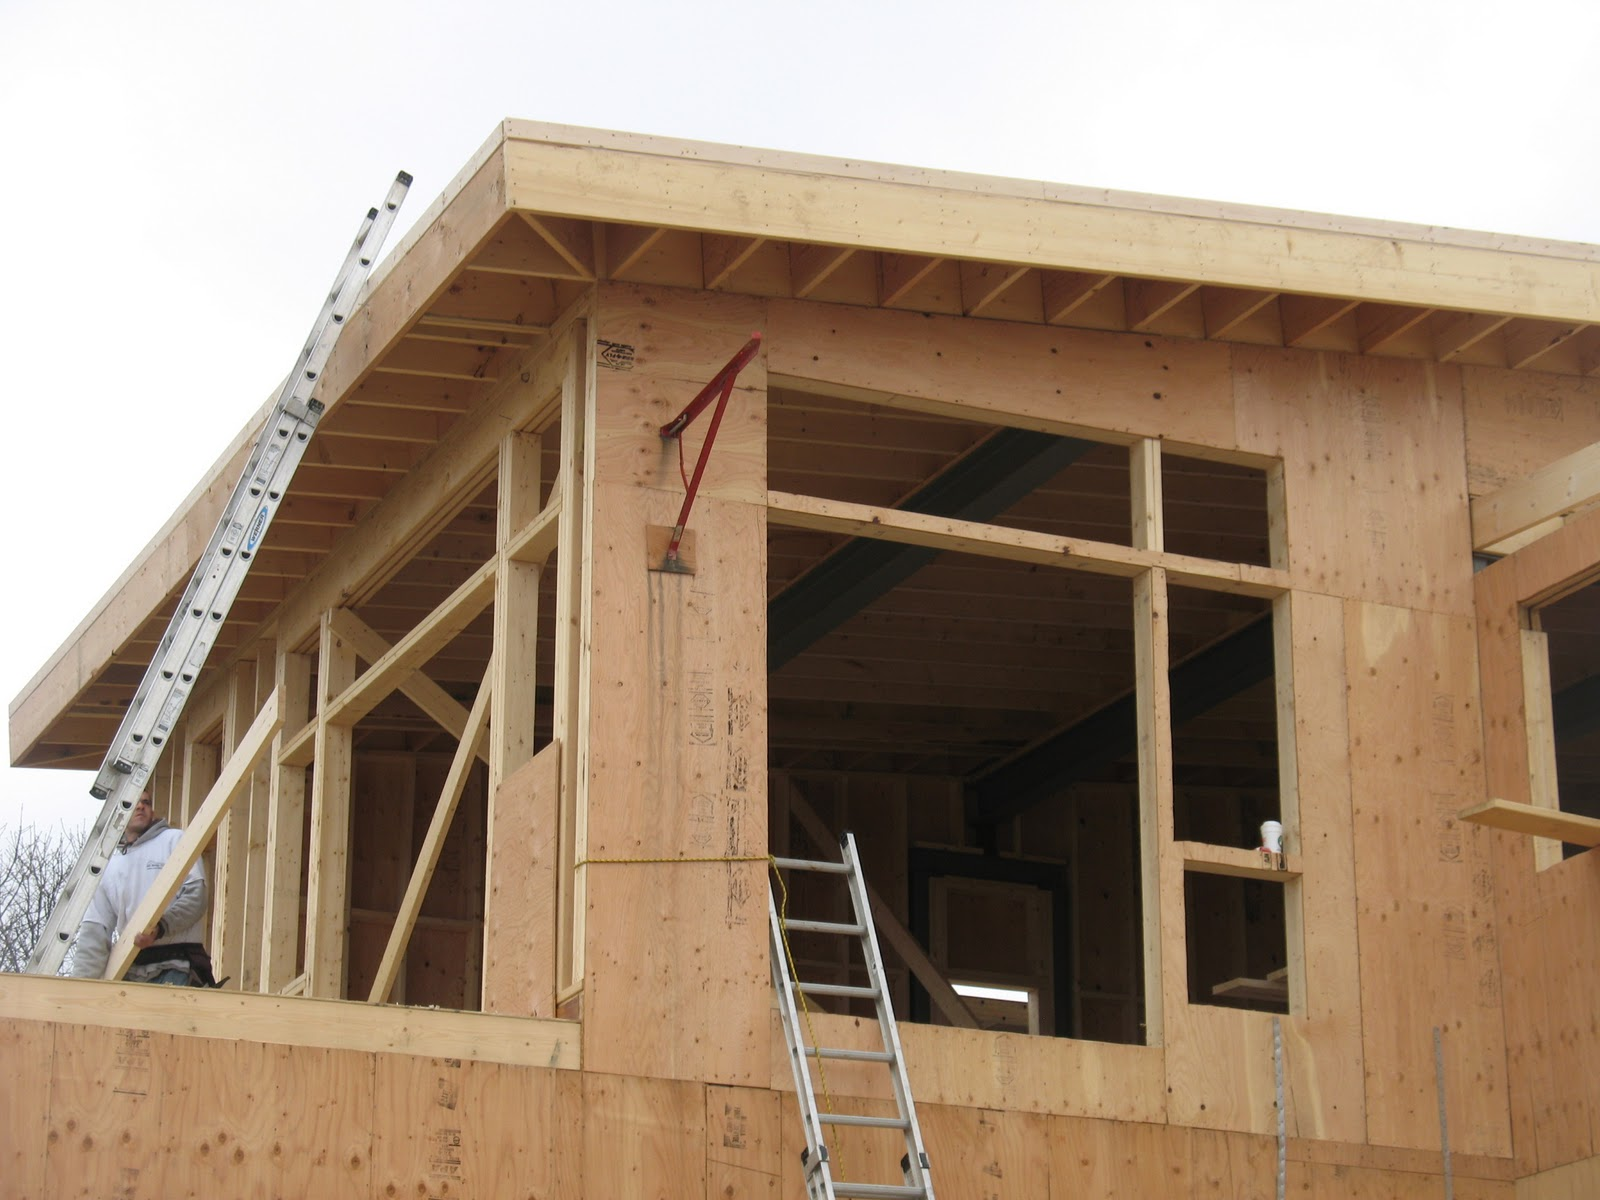 Net Zero Energy Cape Cod Roof Framing Complete